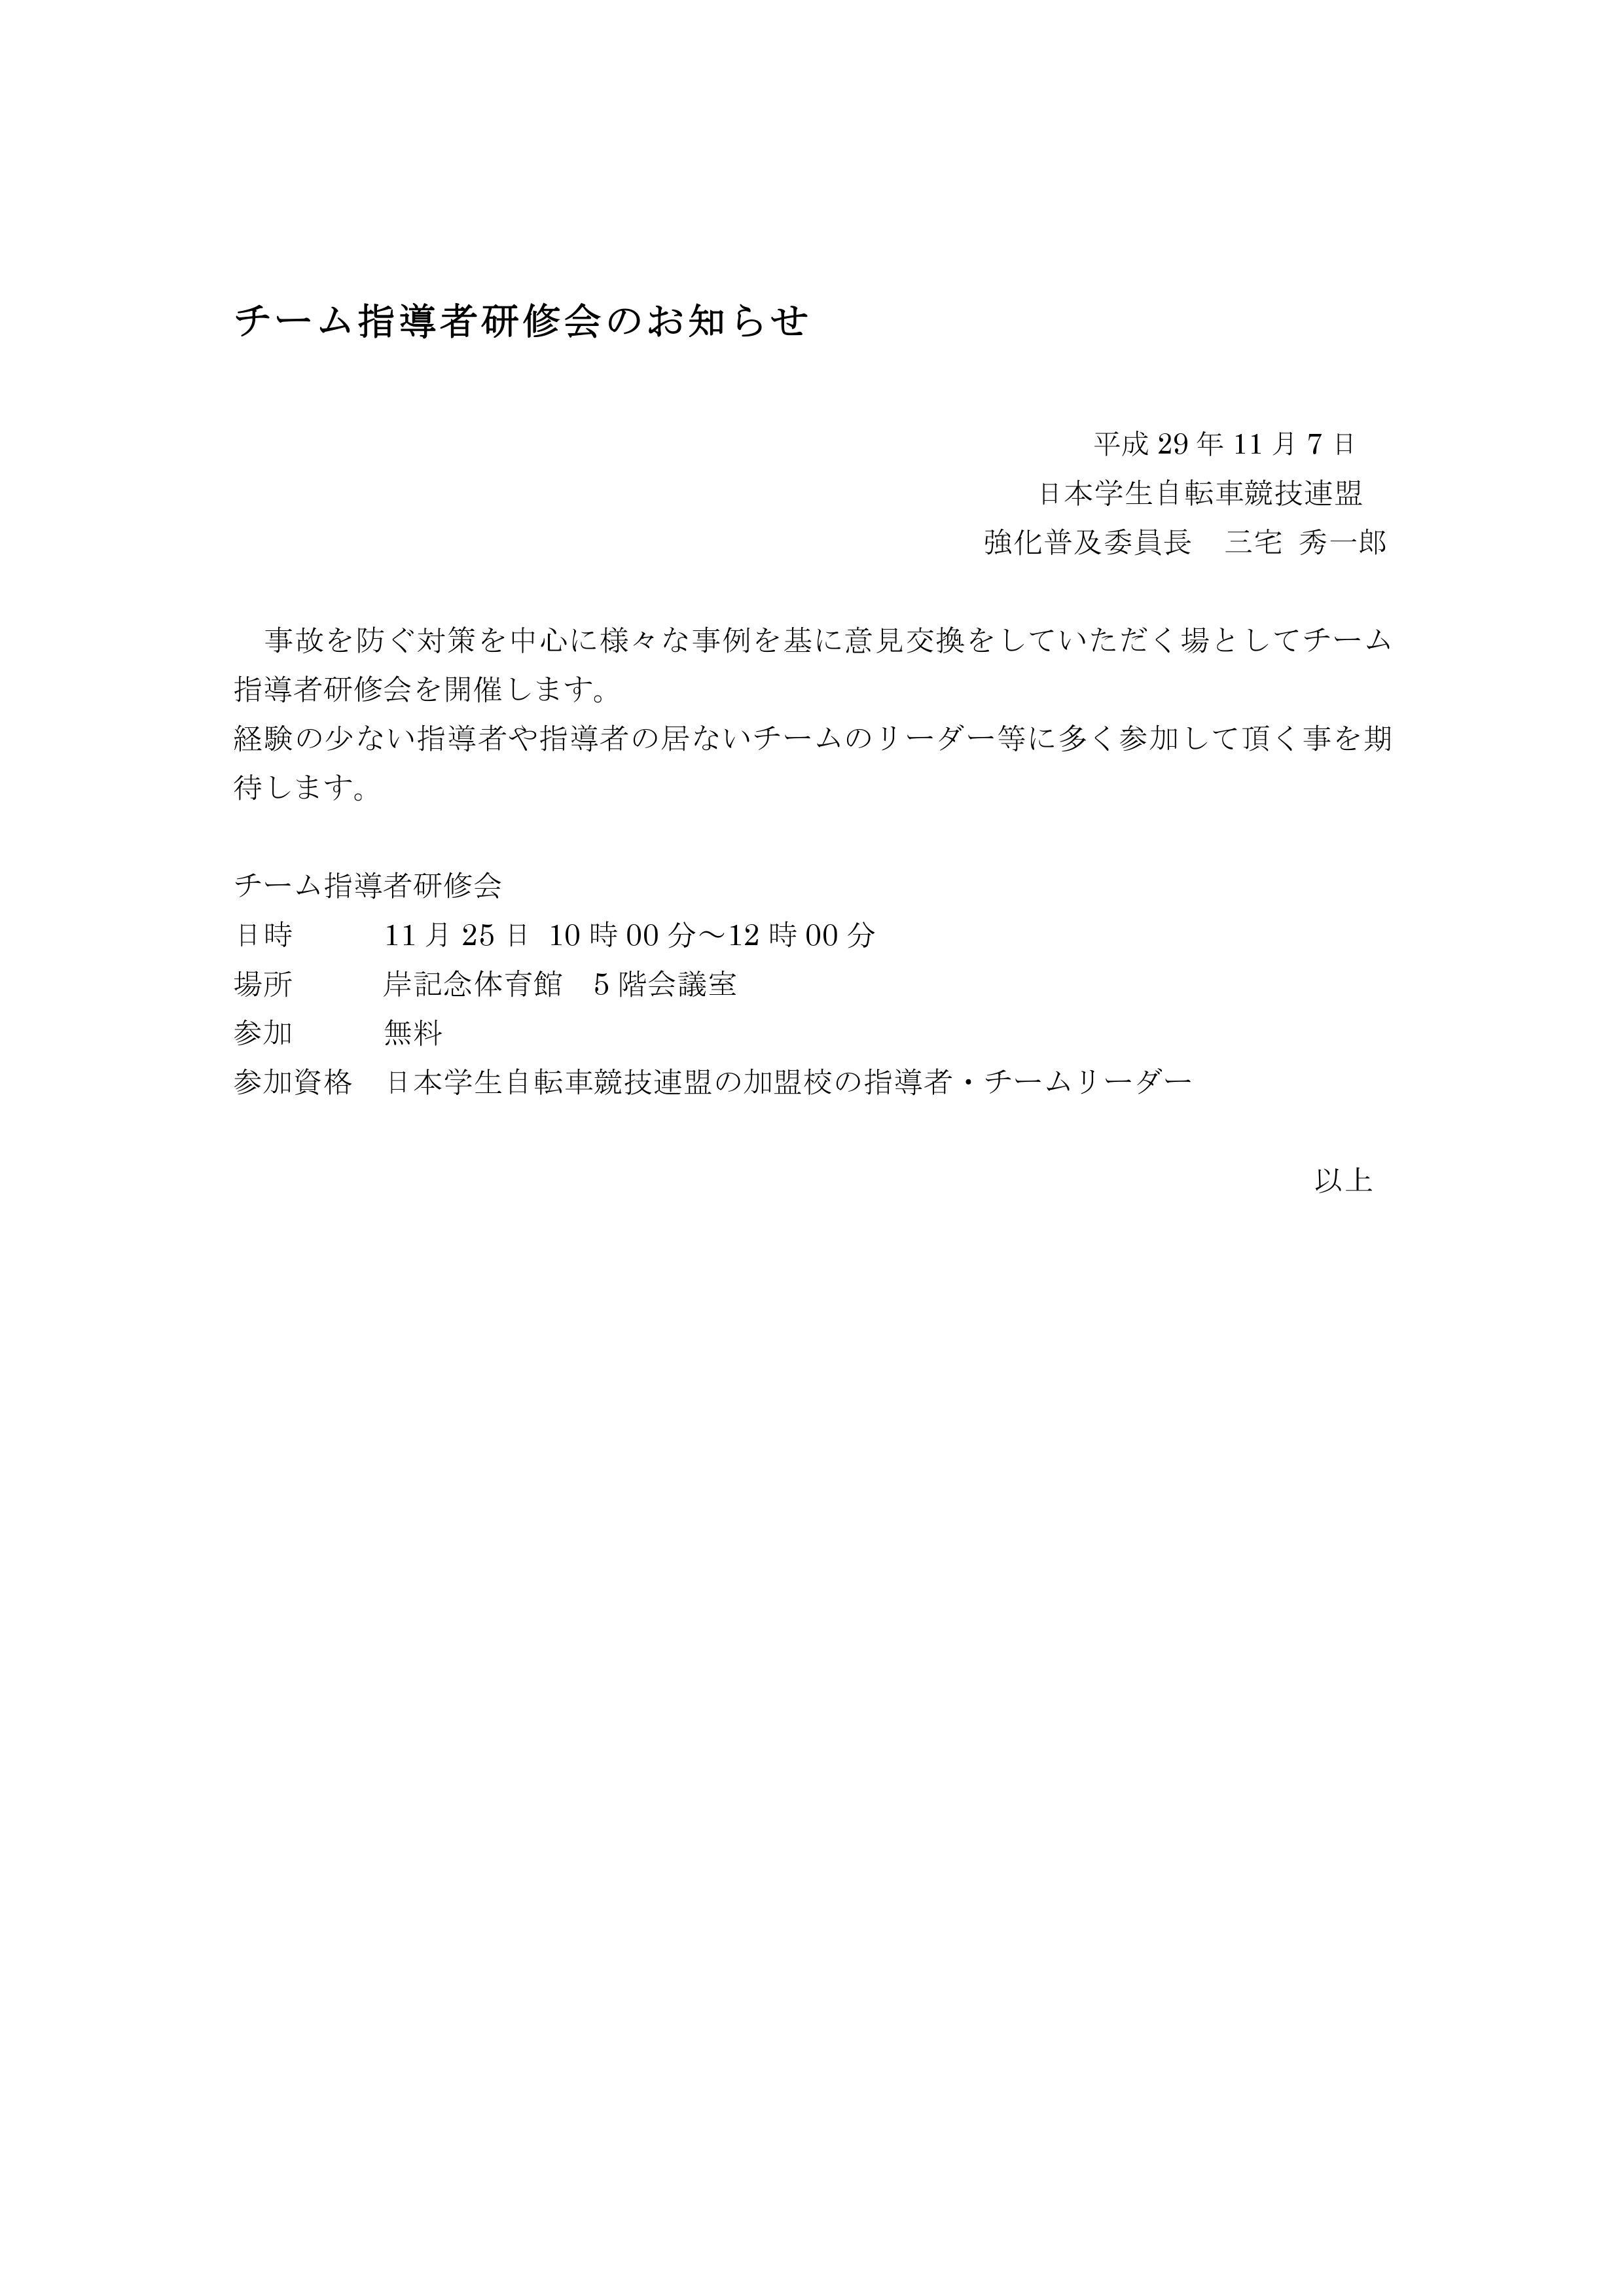 16keishicho_annai